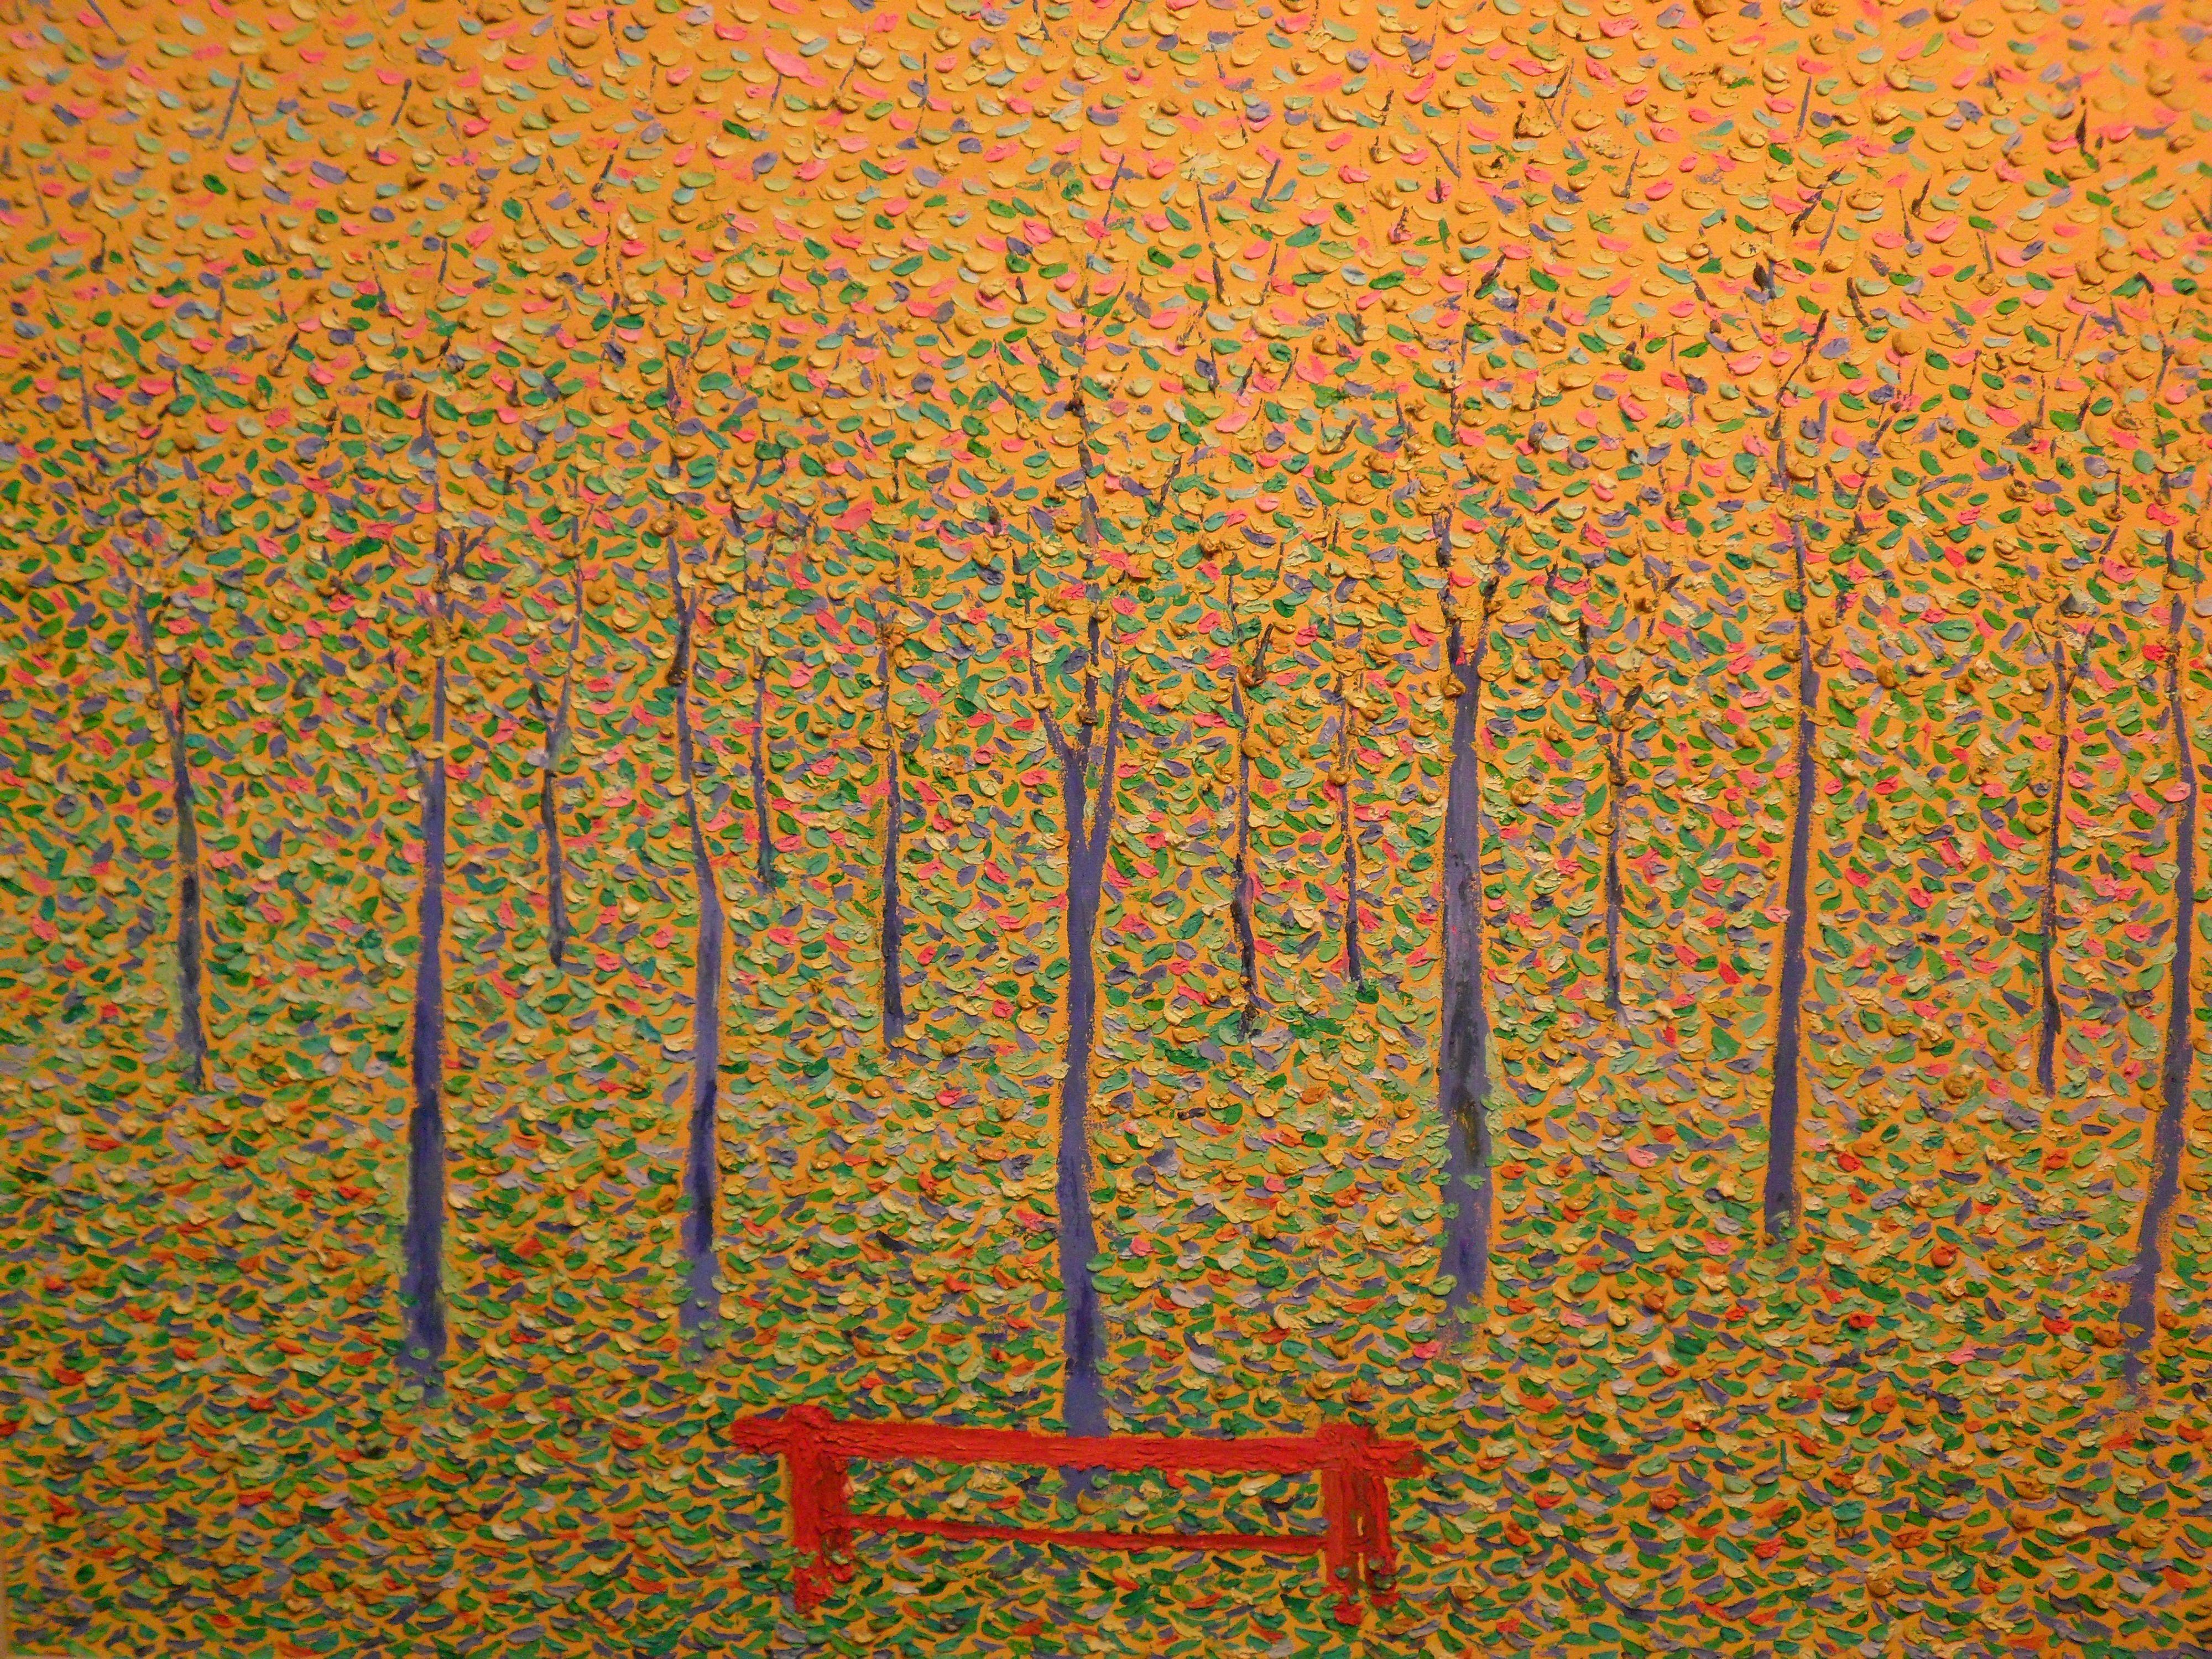 Seurat Pointillism Paintings | pointillism seurat | Pointillism ...